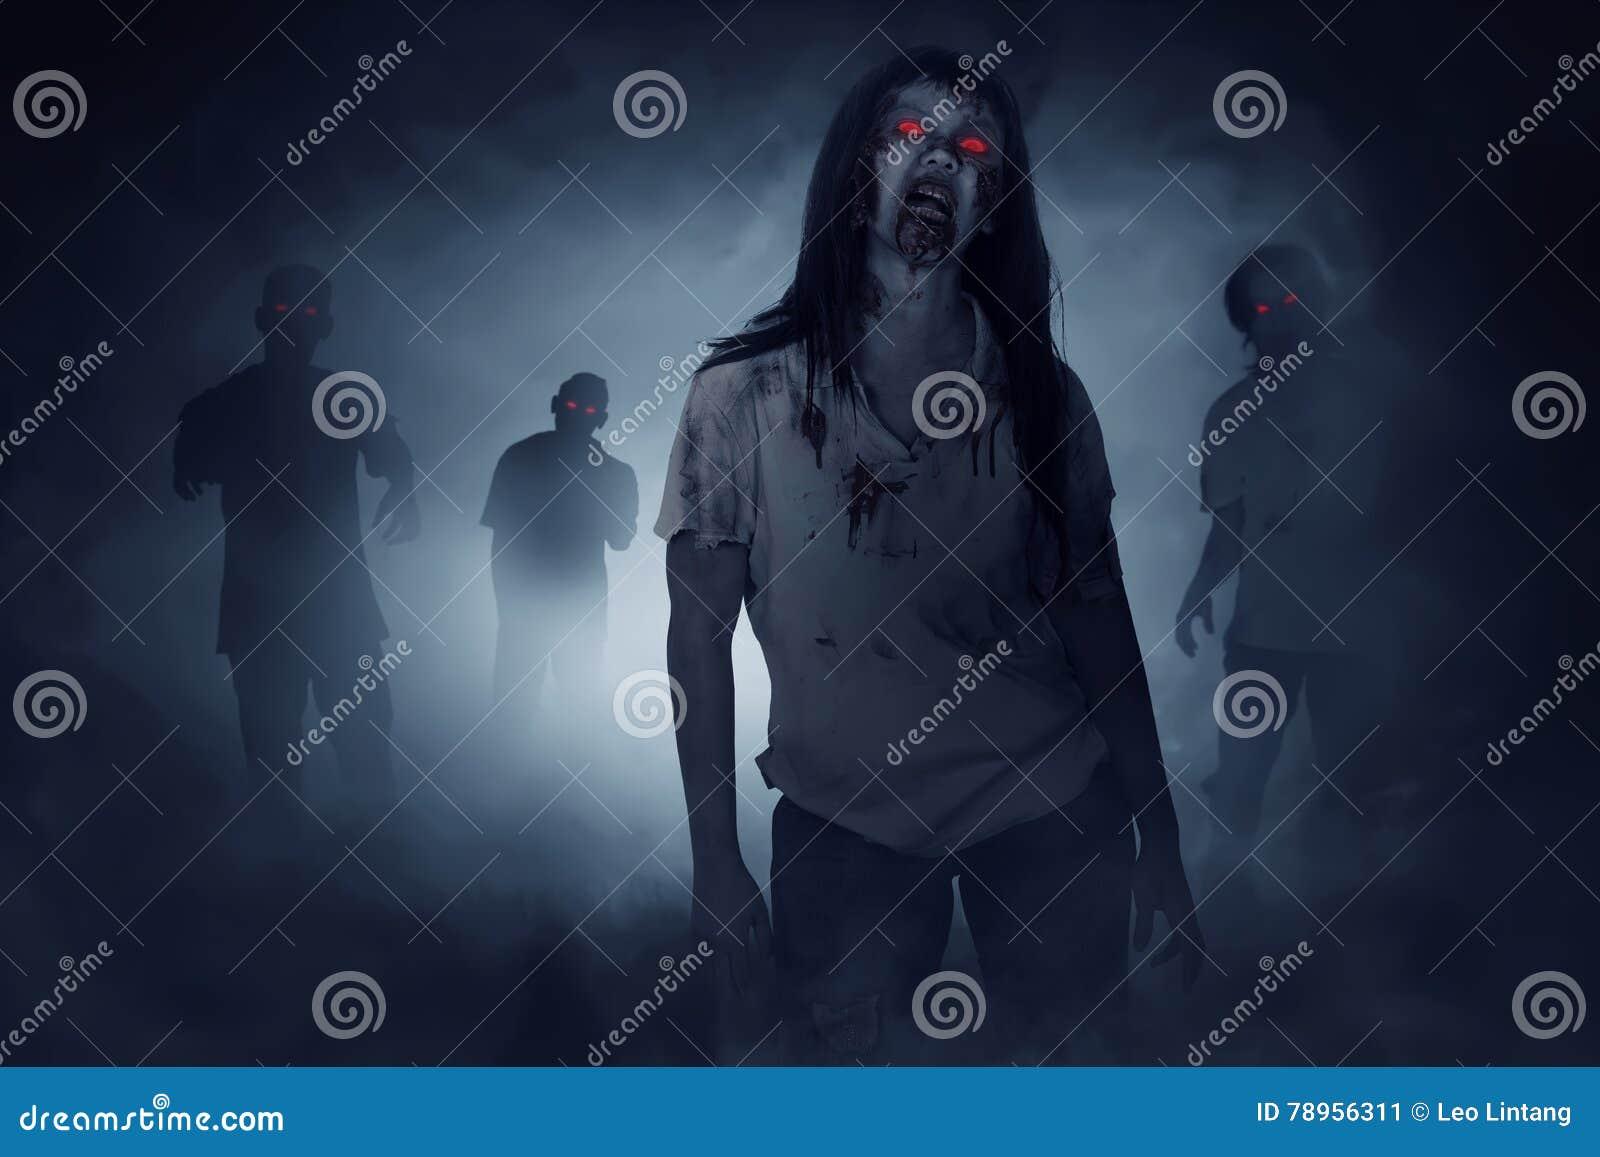 Some zombies walking around